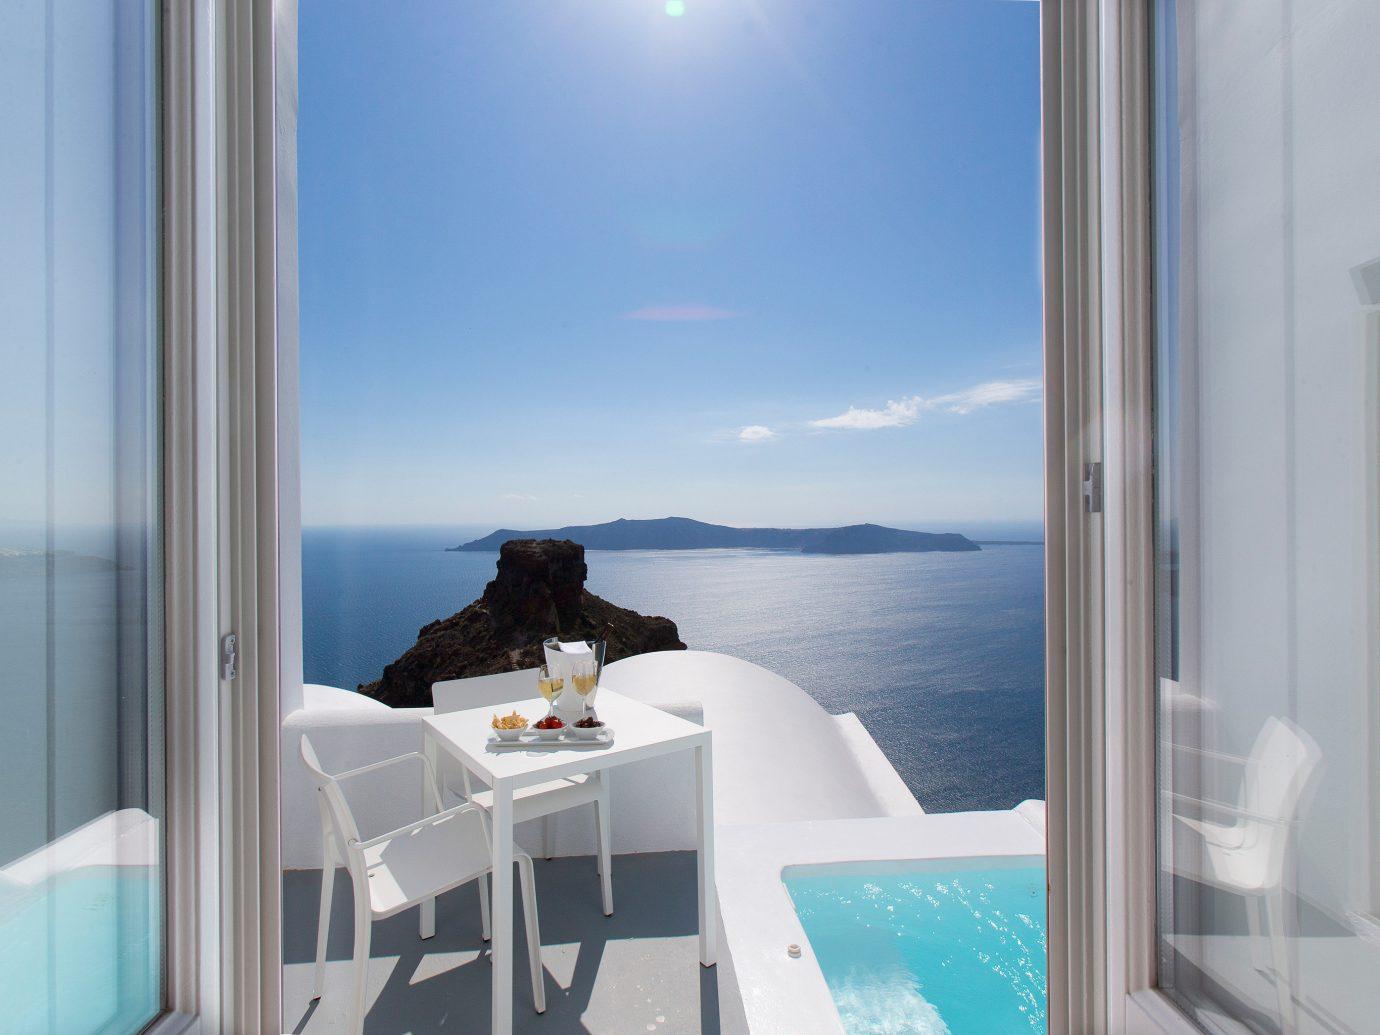 Hotels window blue room property house home swimming pool interior design condominium Design apartment yacht